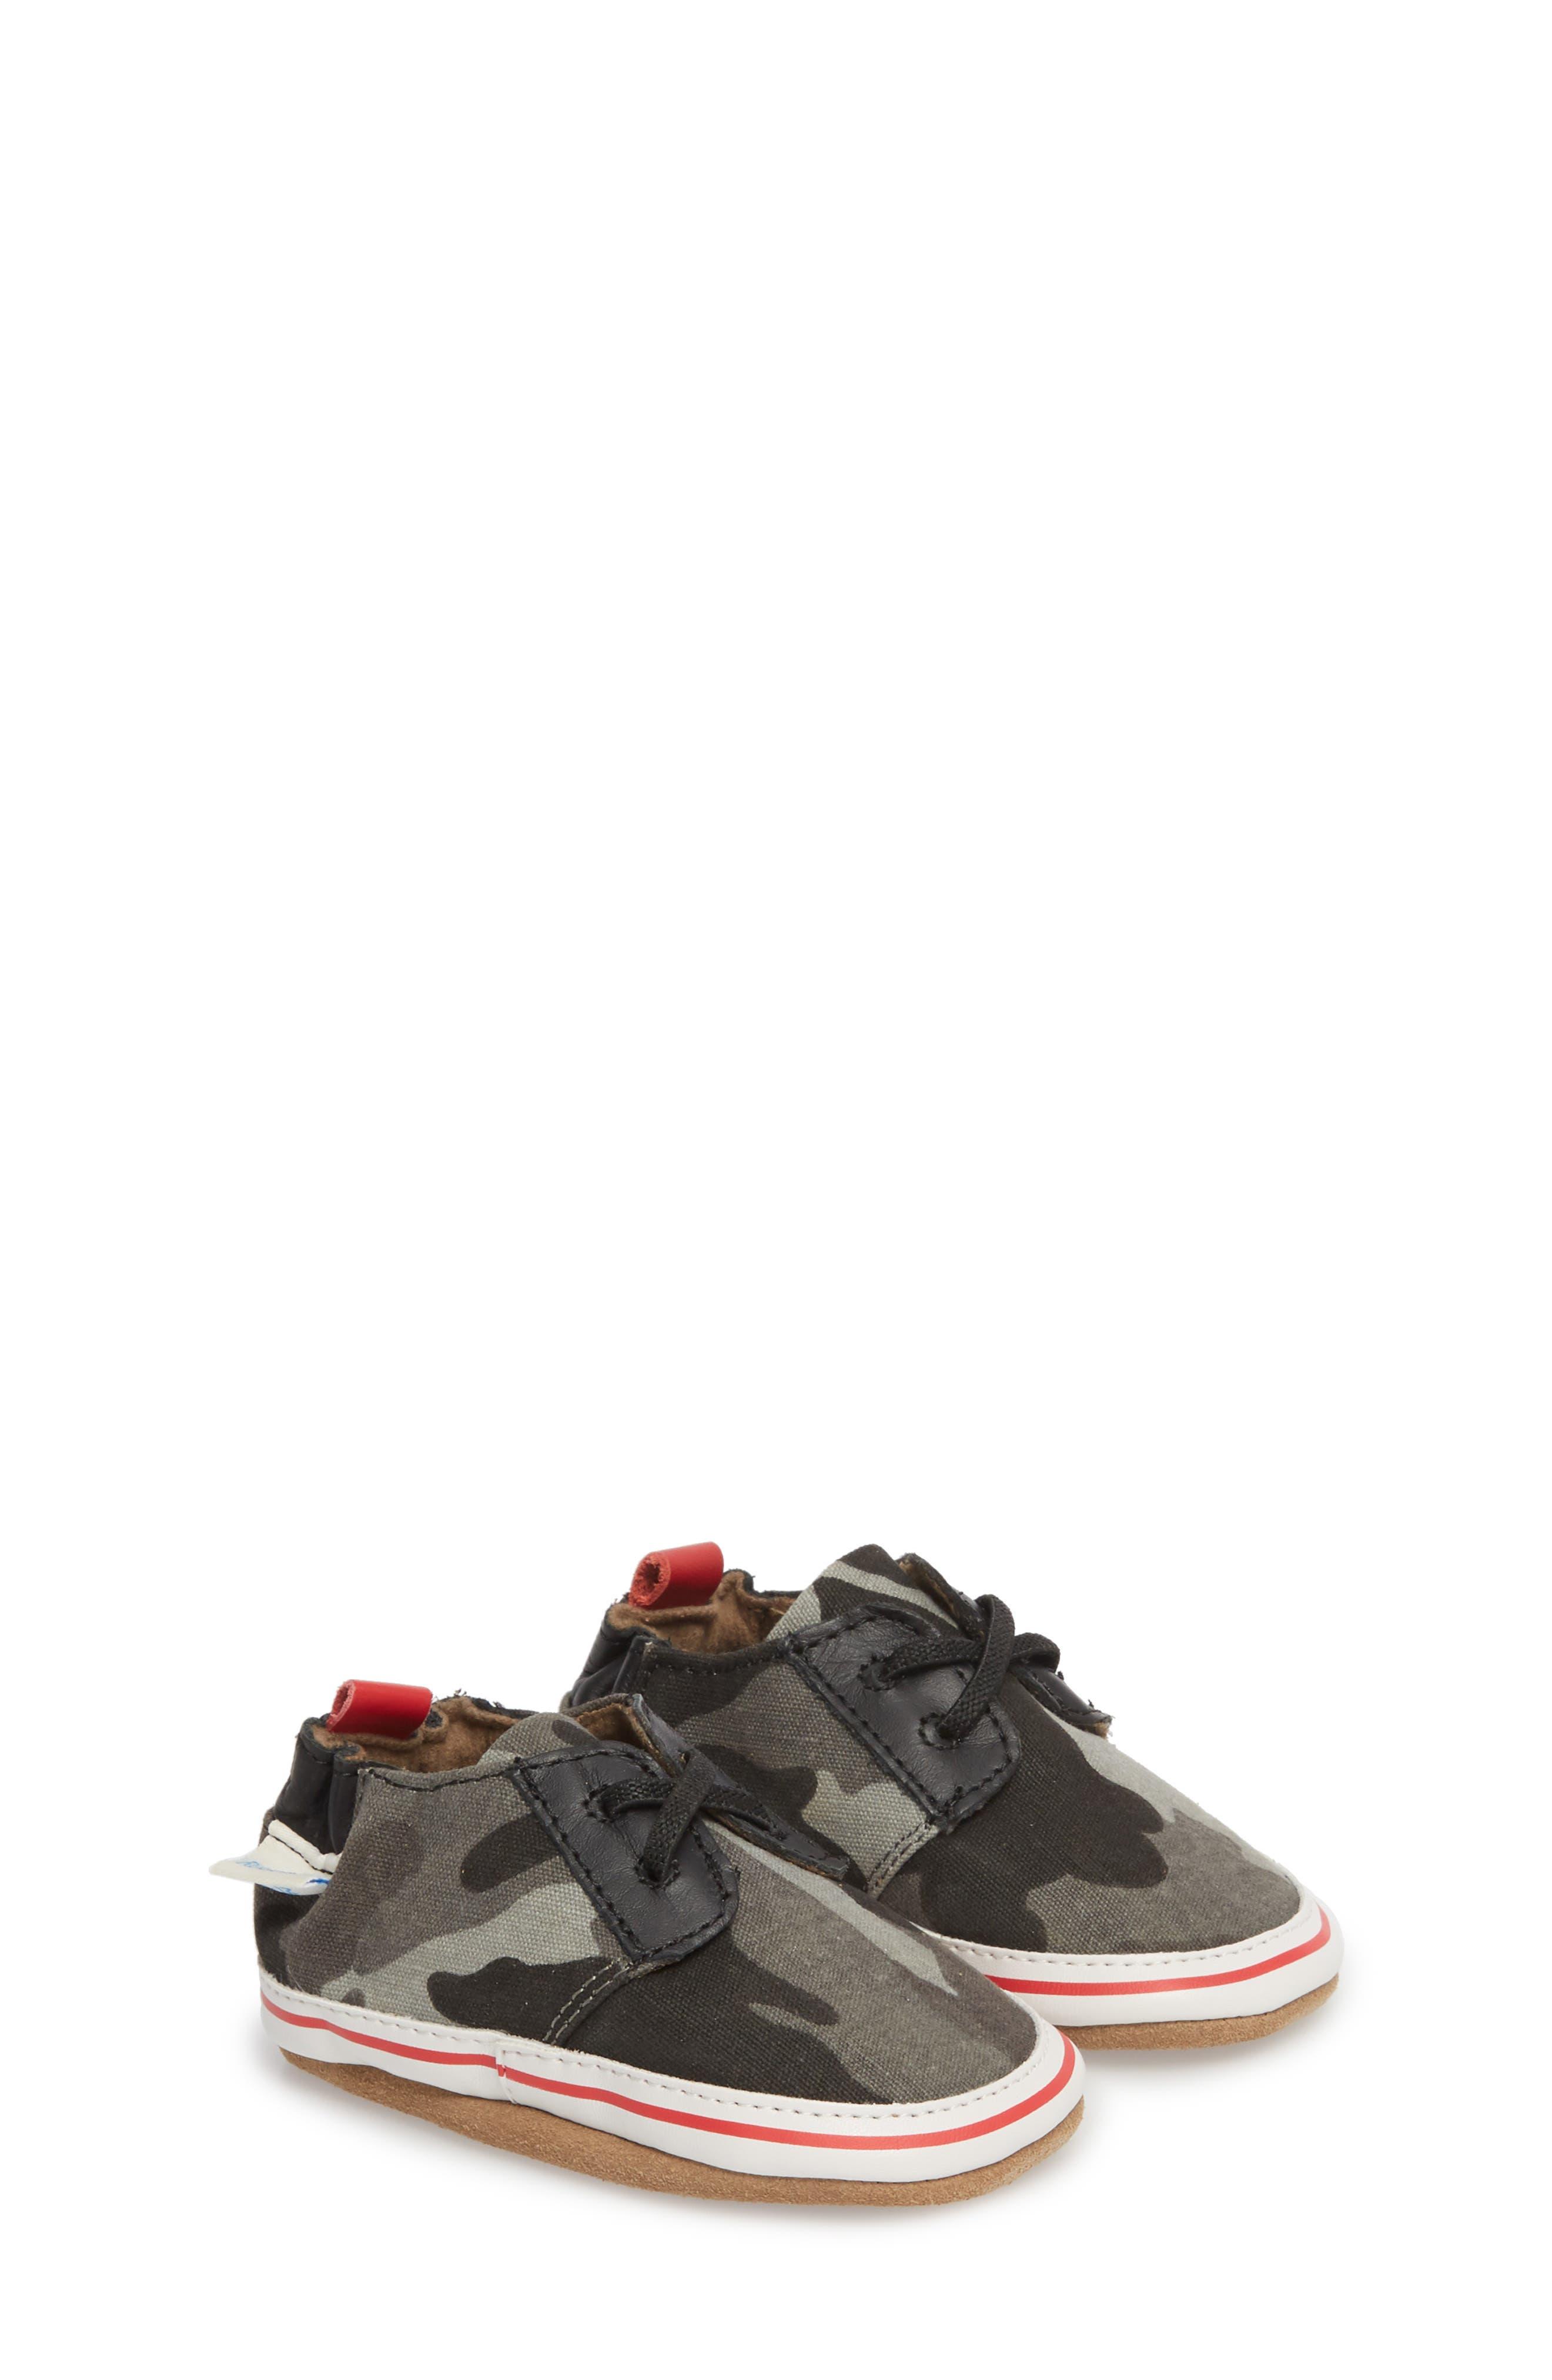 Robeez® Cool & Casual Camo Print Crib Shoe